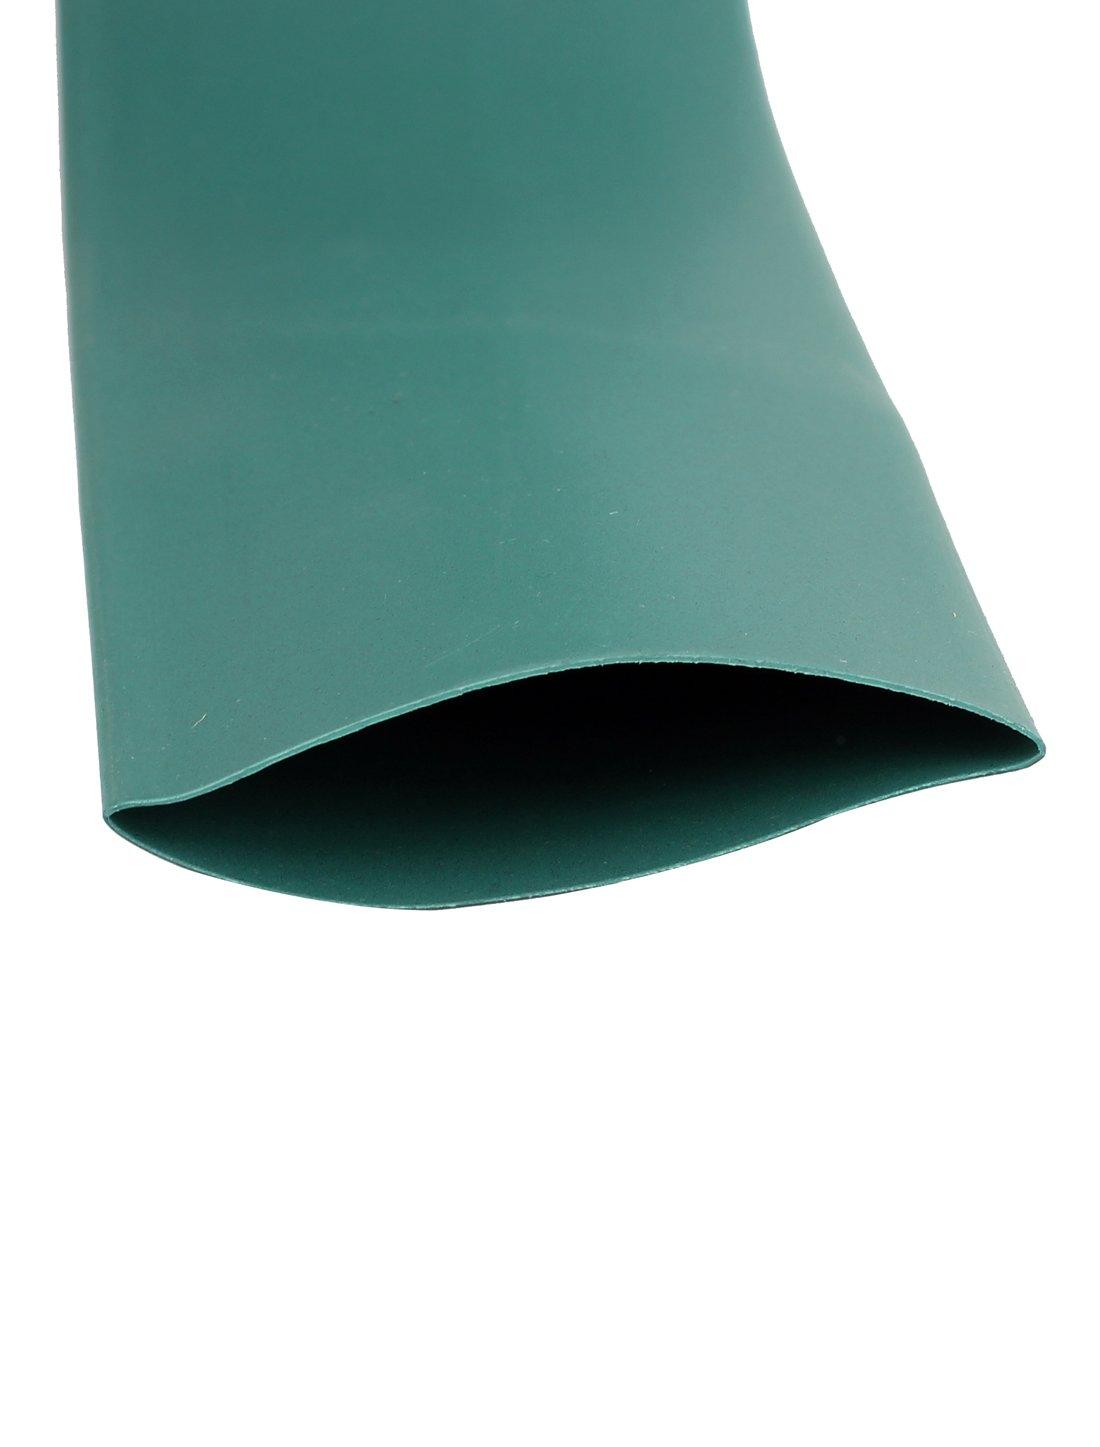 3m Largo 35mm Dia 2:1 Poliolefina Tubo Termorretr/áctil Funda Verde